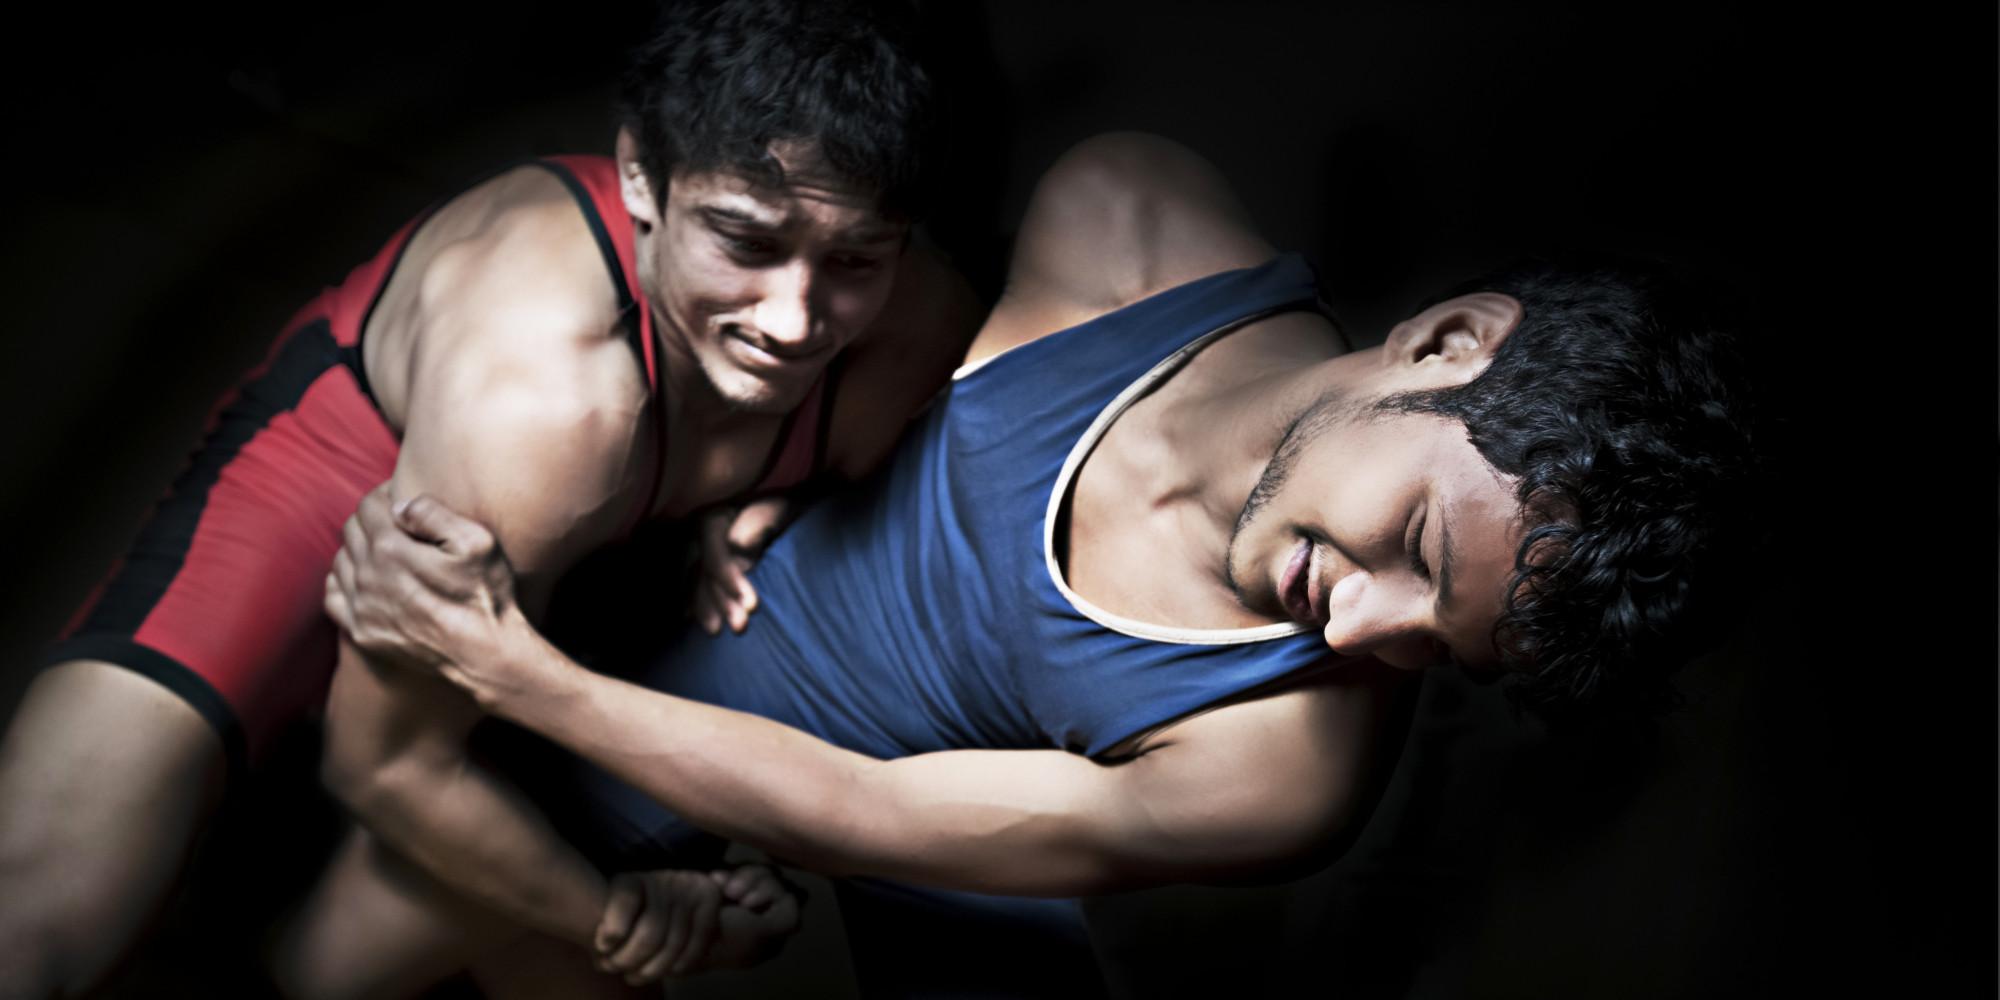 Video wrestling gay